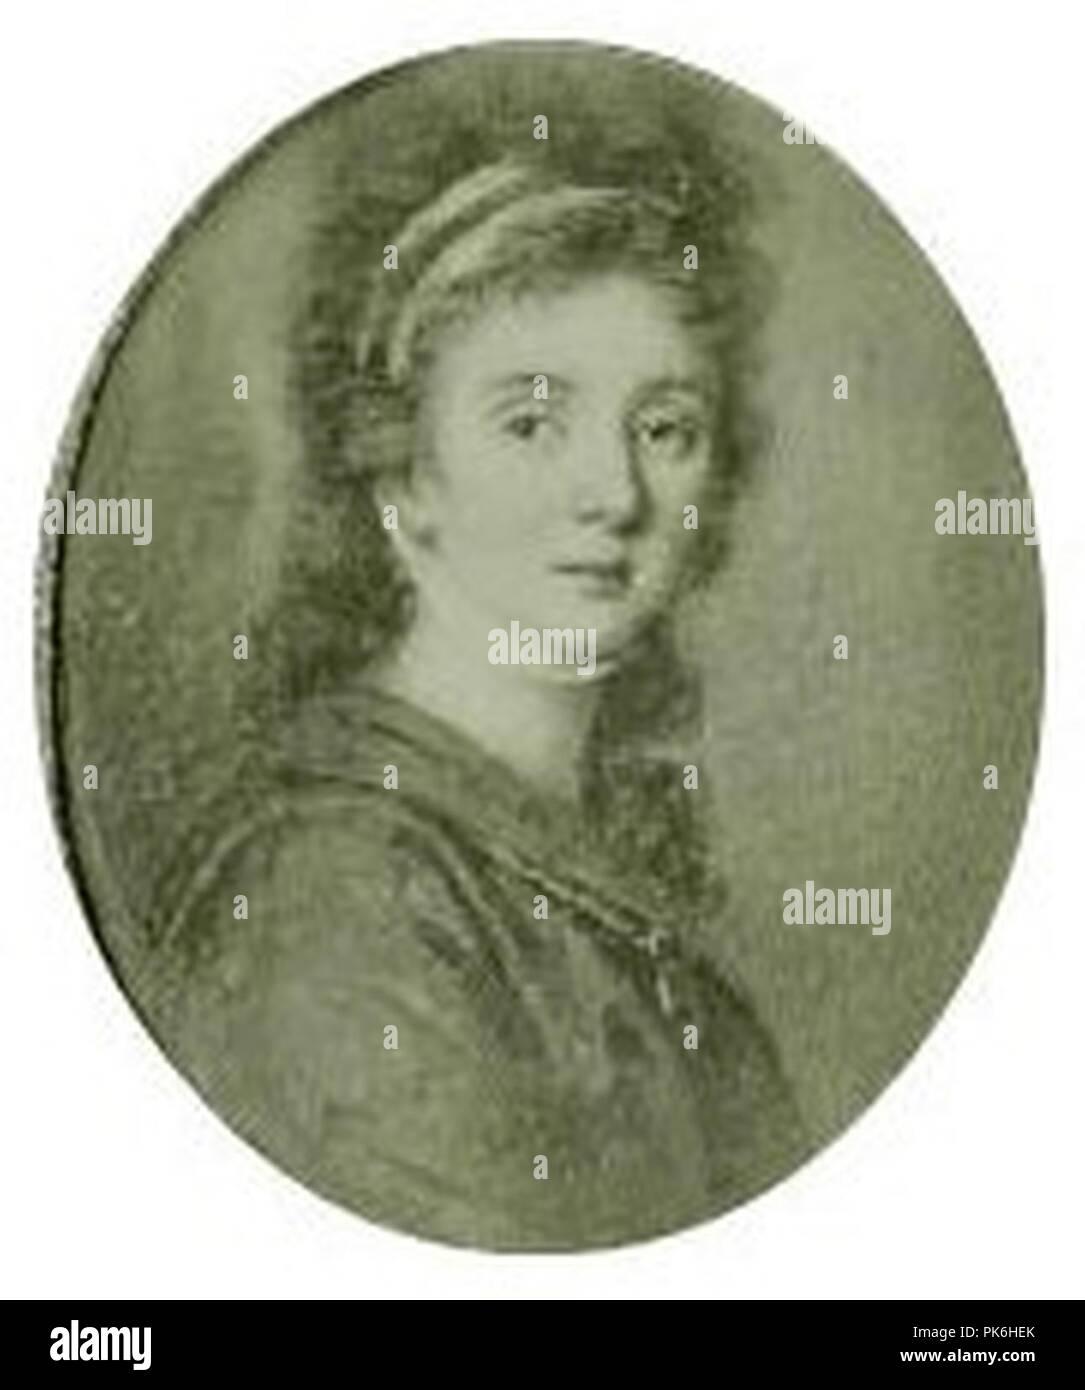 Benedikte Sievers. - Stock Image